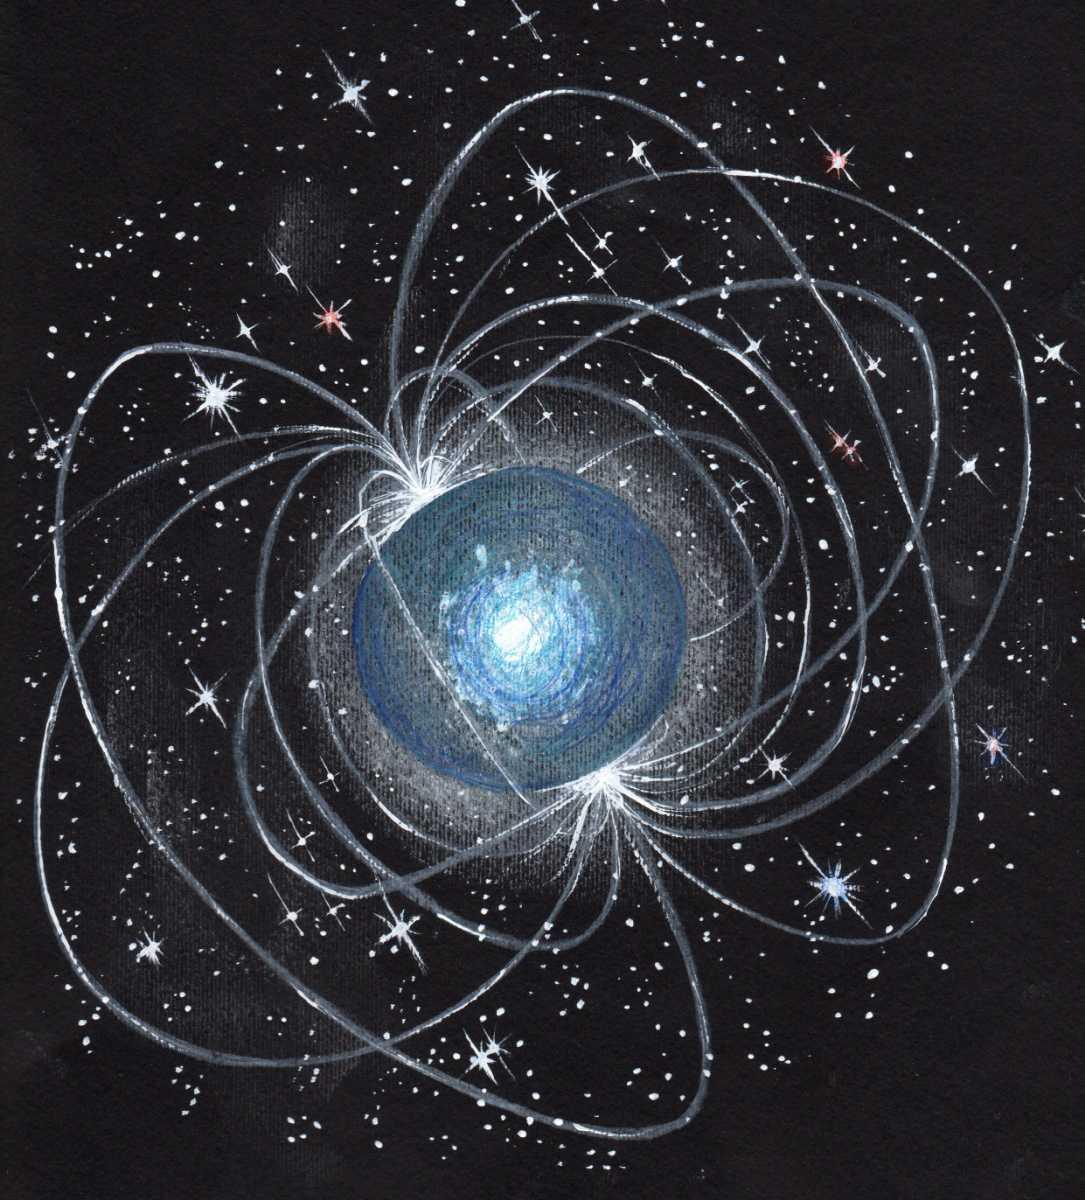 neutron star definition - HD1085×1200